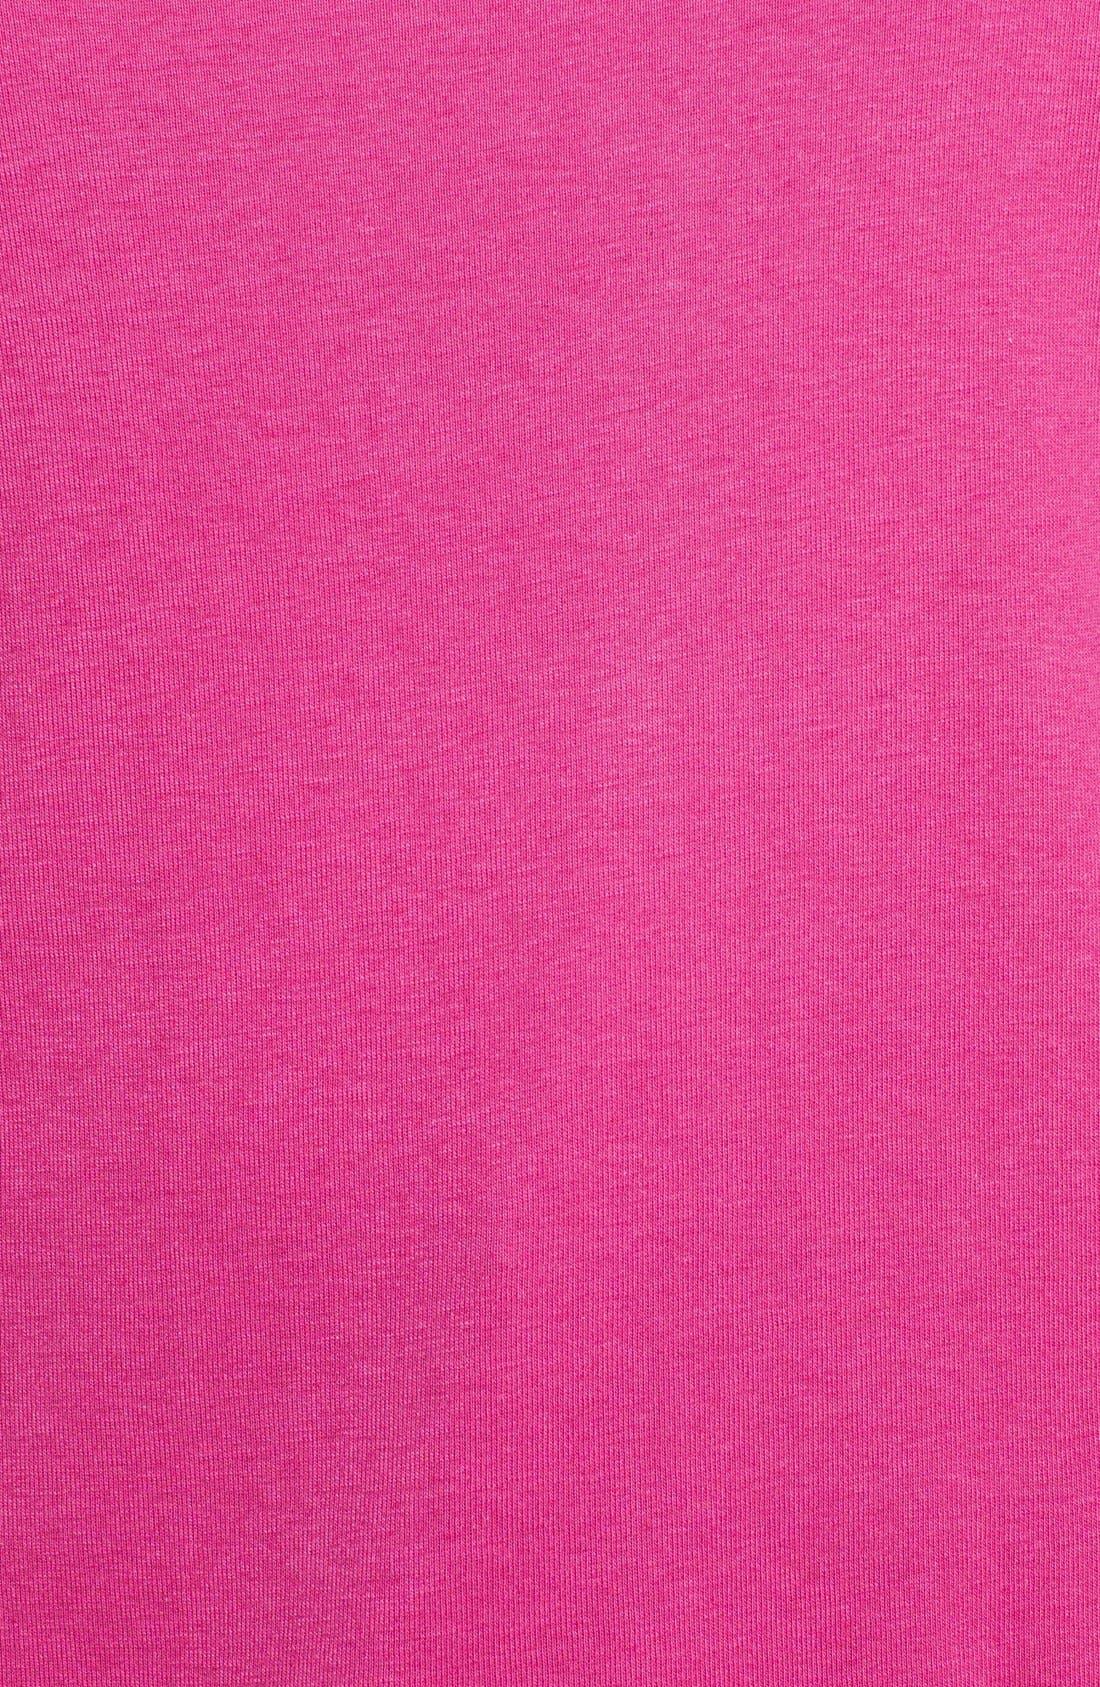 Alternate Image 3  - Sejour Short Sleeve Scoop Neck Tee (Plus Size)